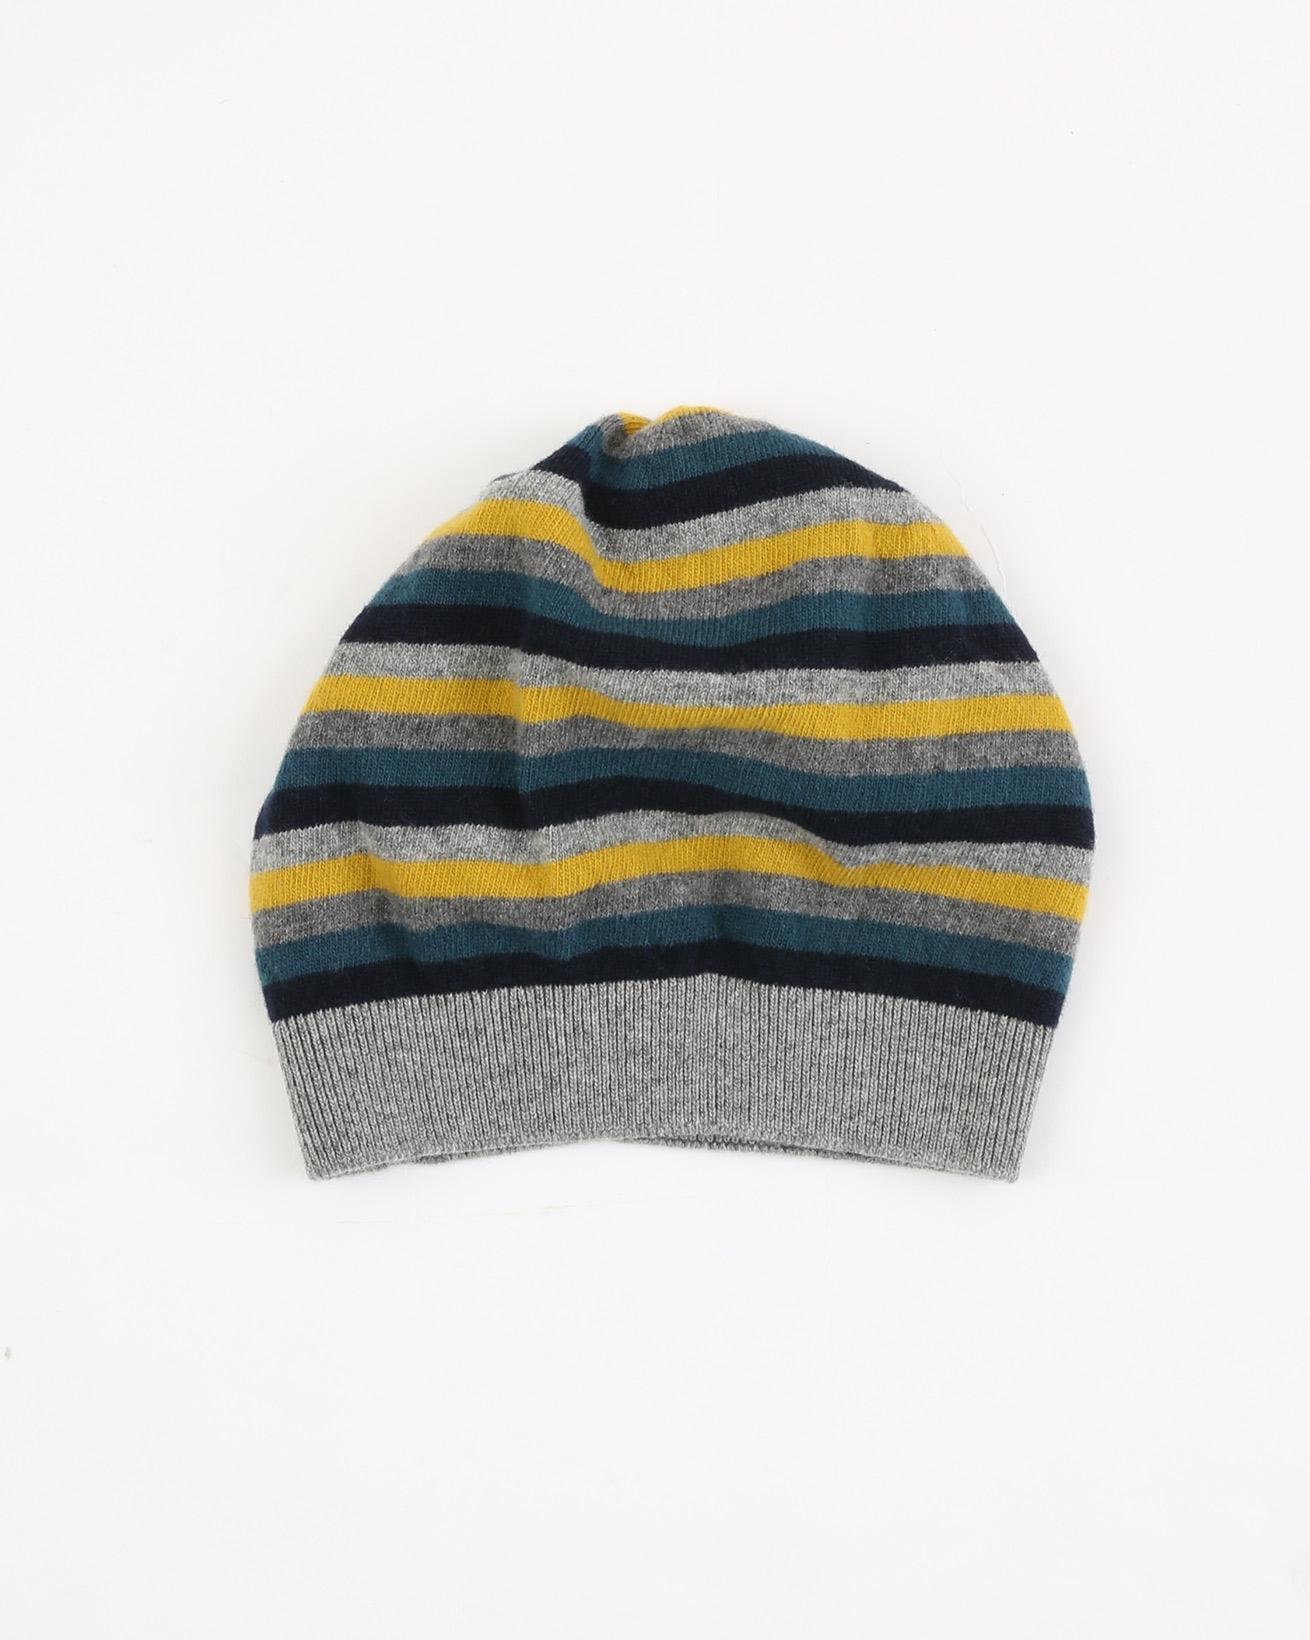 Multi Stripe Hat - One Size - Gorse/Navy - 1884